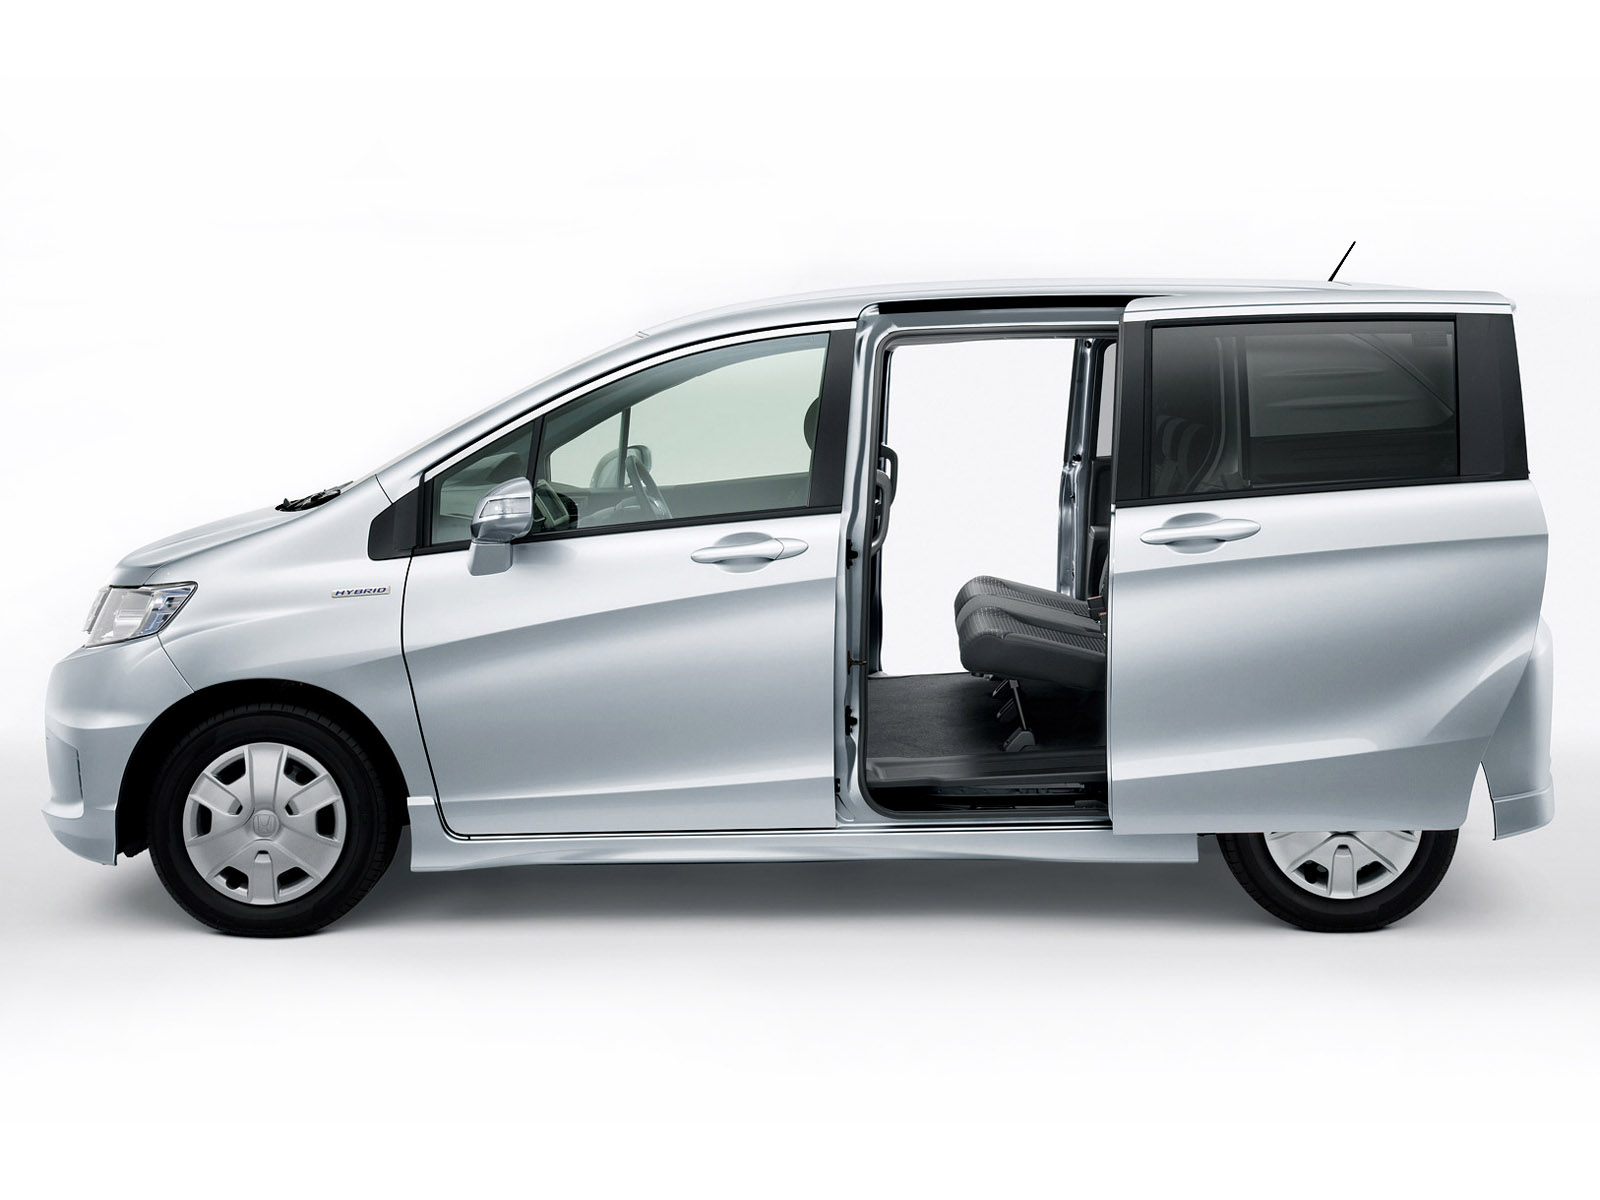 Honda Freed I 2008 - 2016 Compact MPV #6